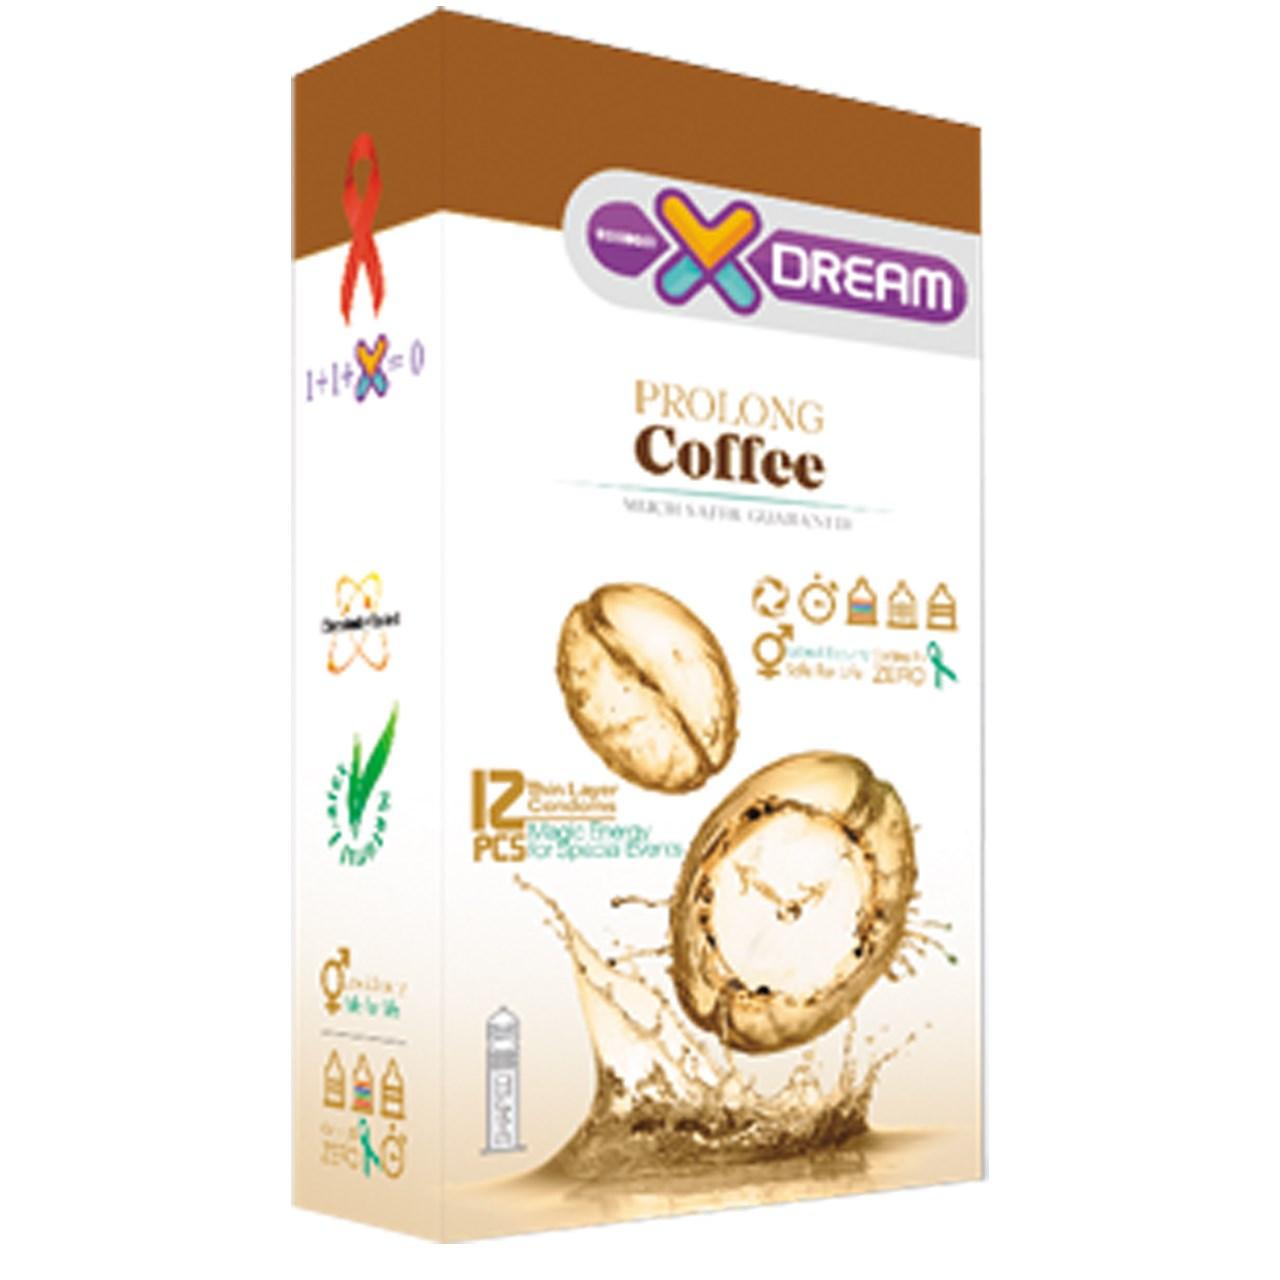 عکس کاندوم ایکس دریم مدل Coffee بسته 12 عددی